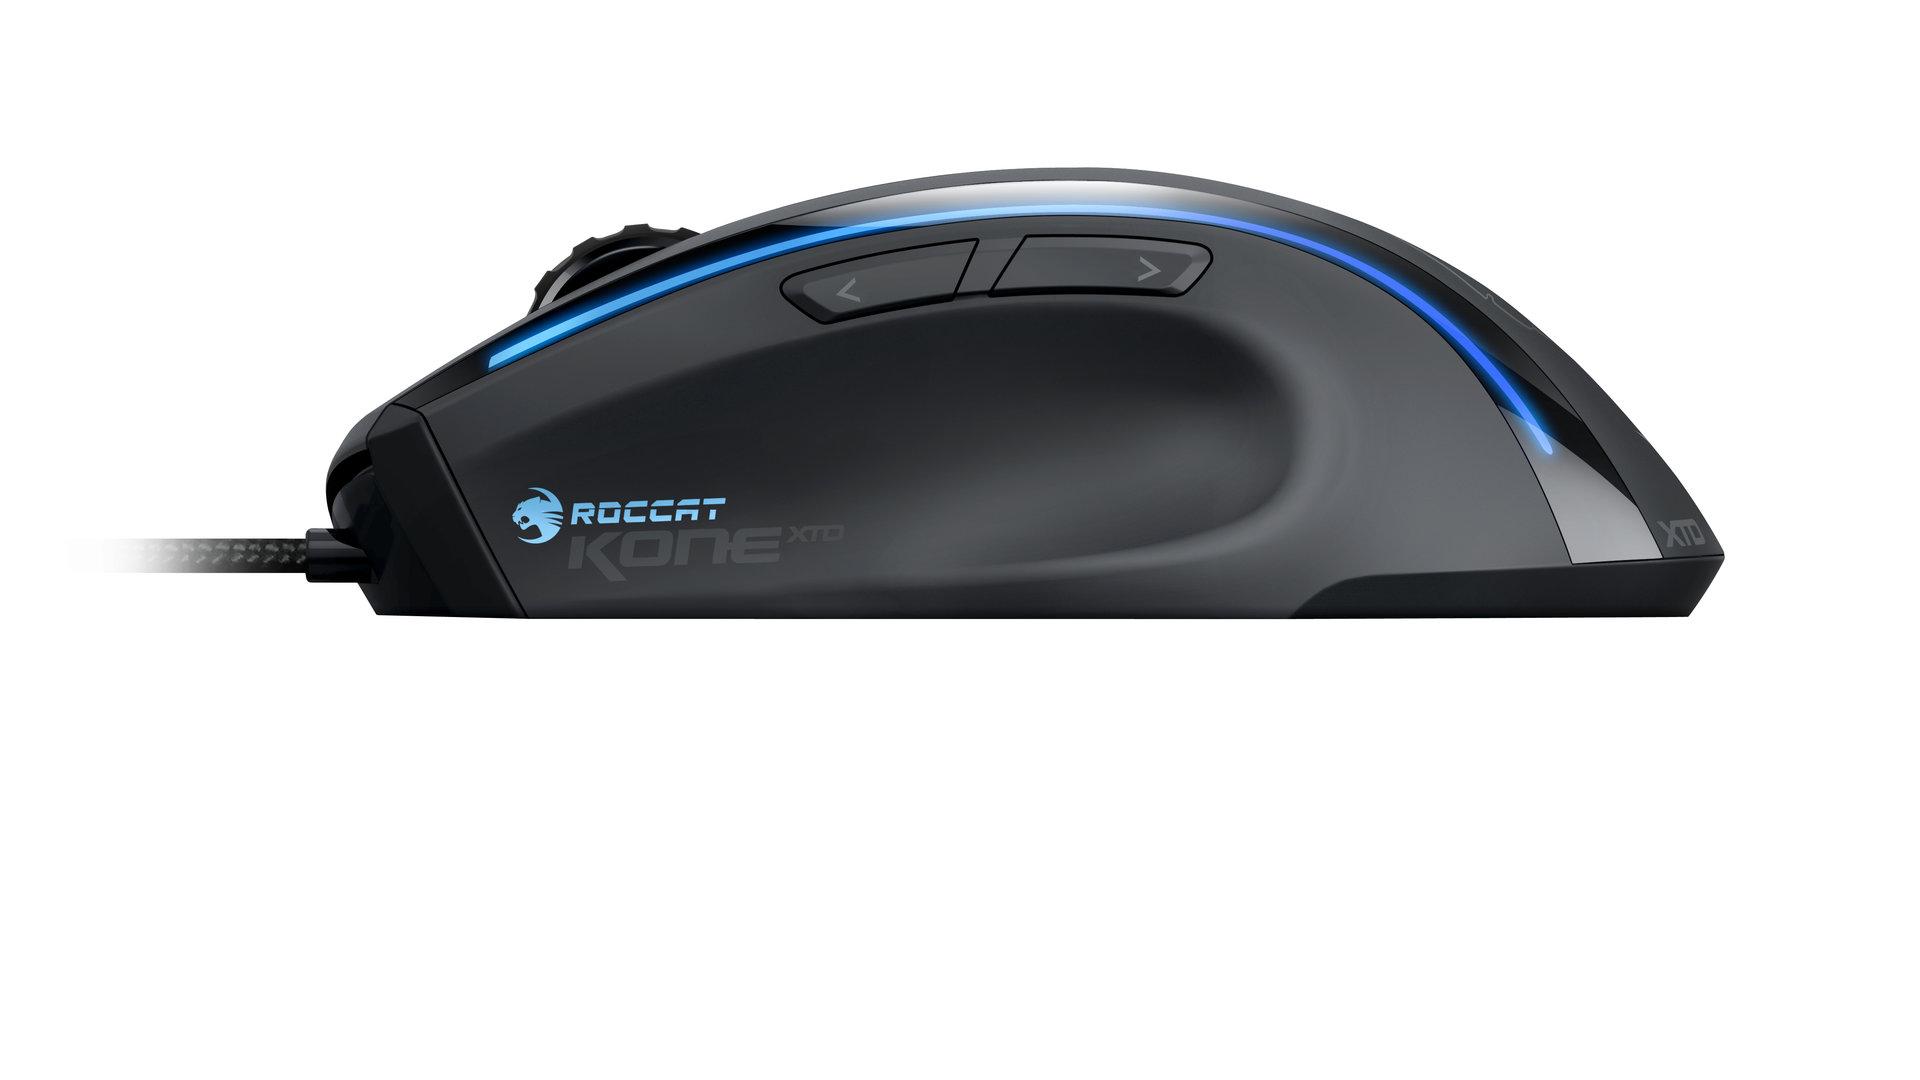 Roccat Kone XTD